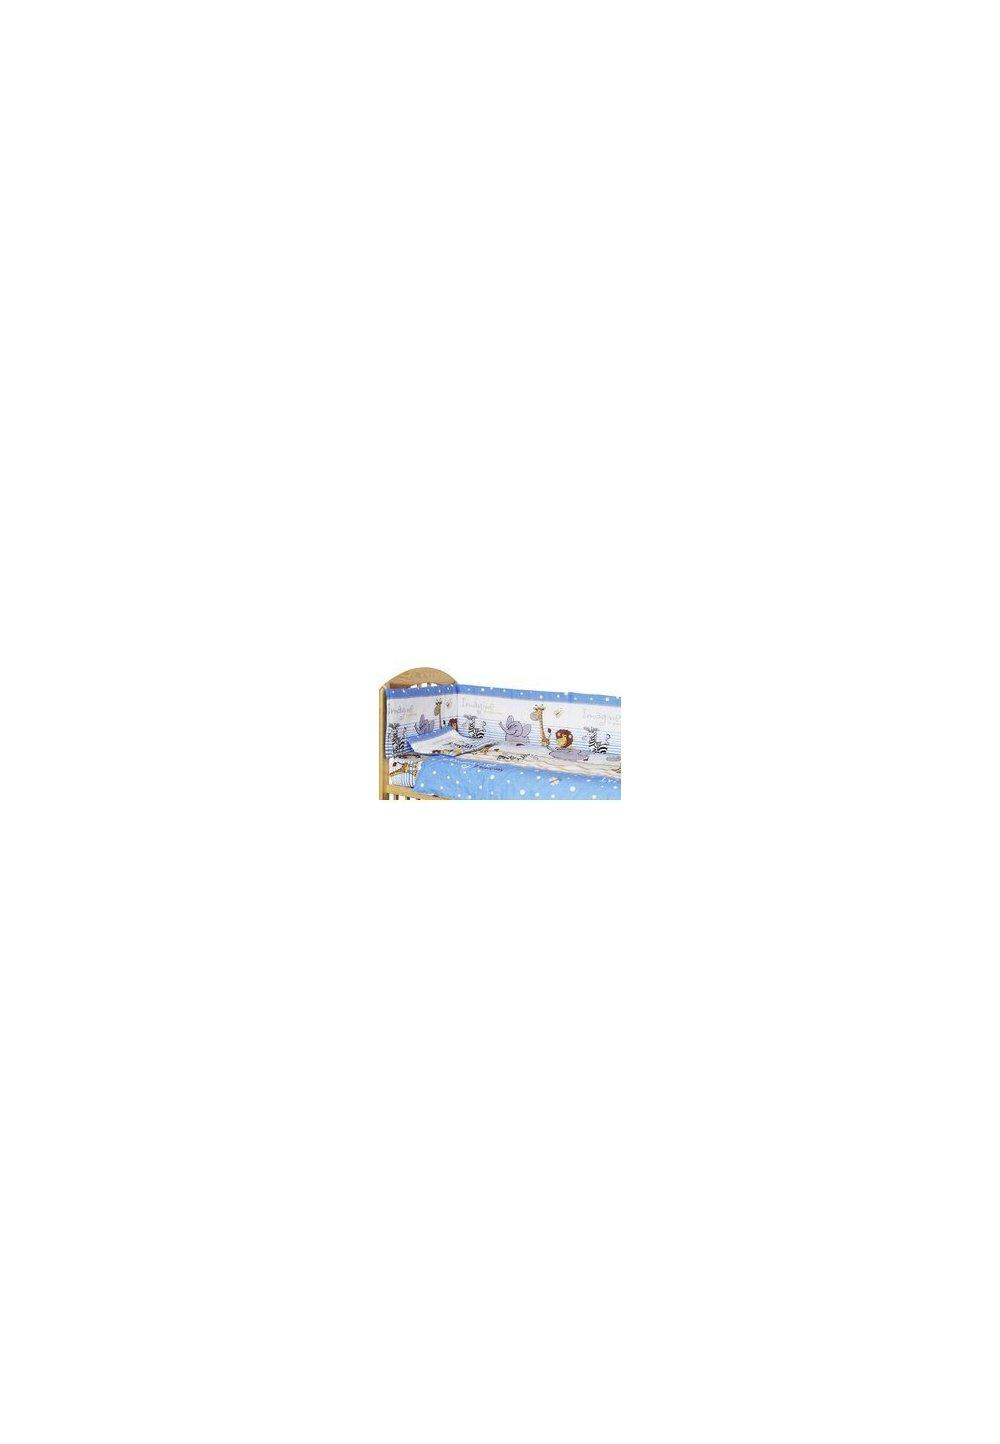 Lenjerie 5 piese animalute albastra, 140x70cm imagine